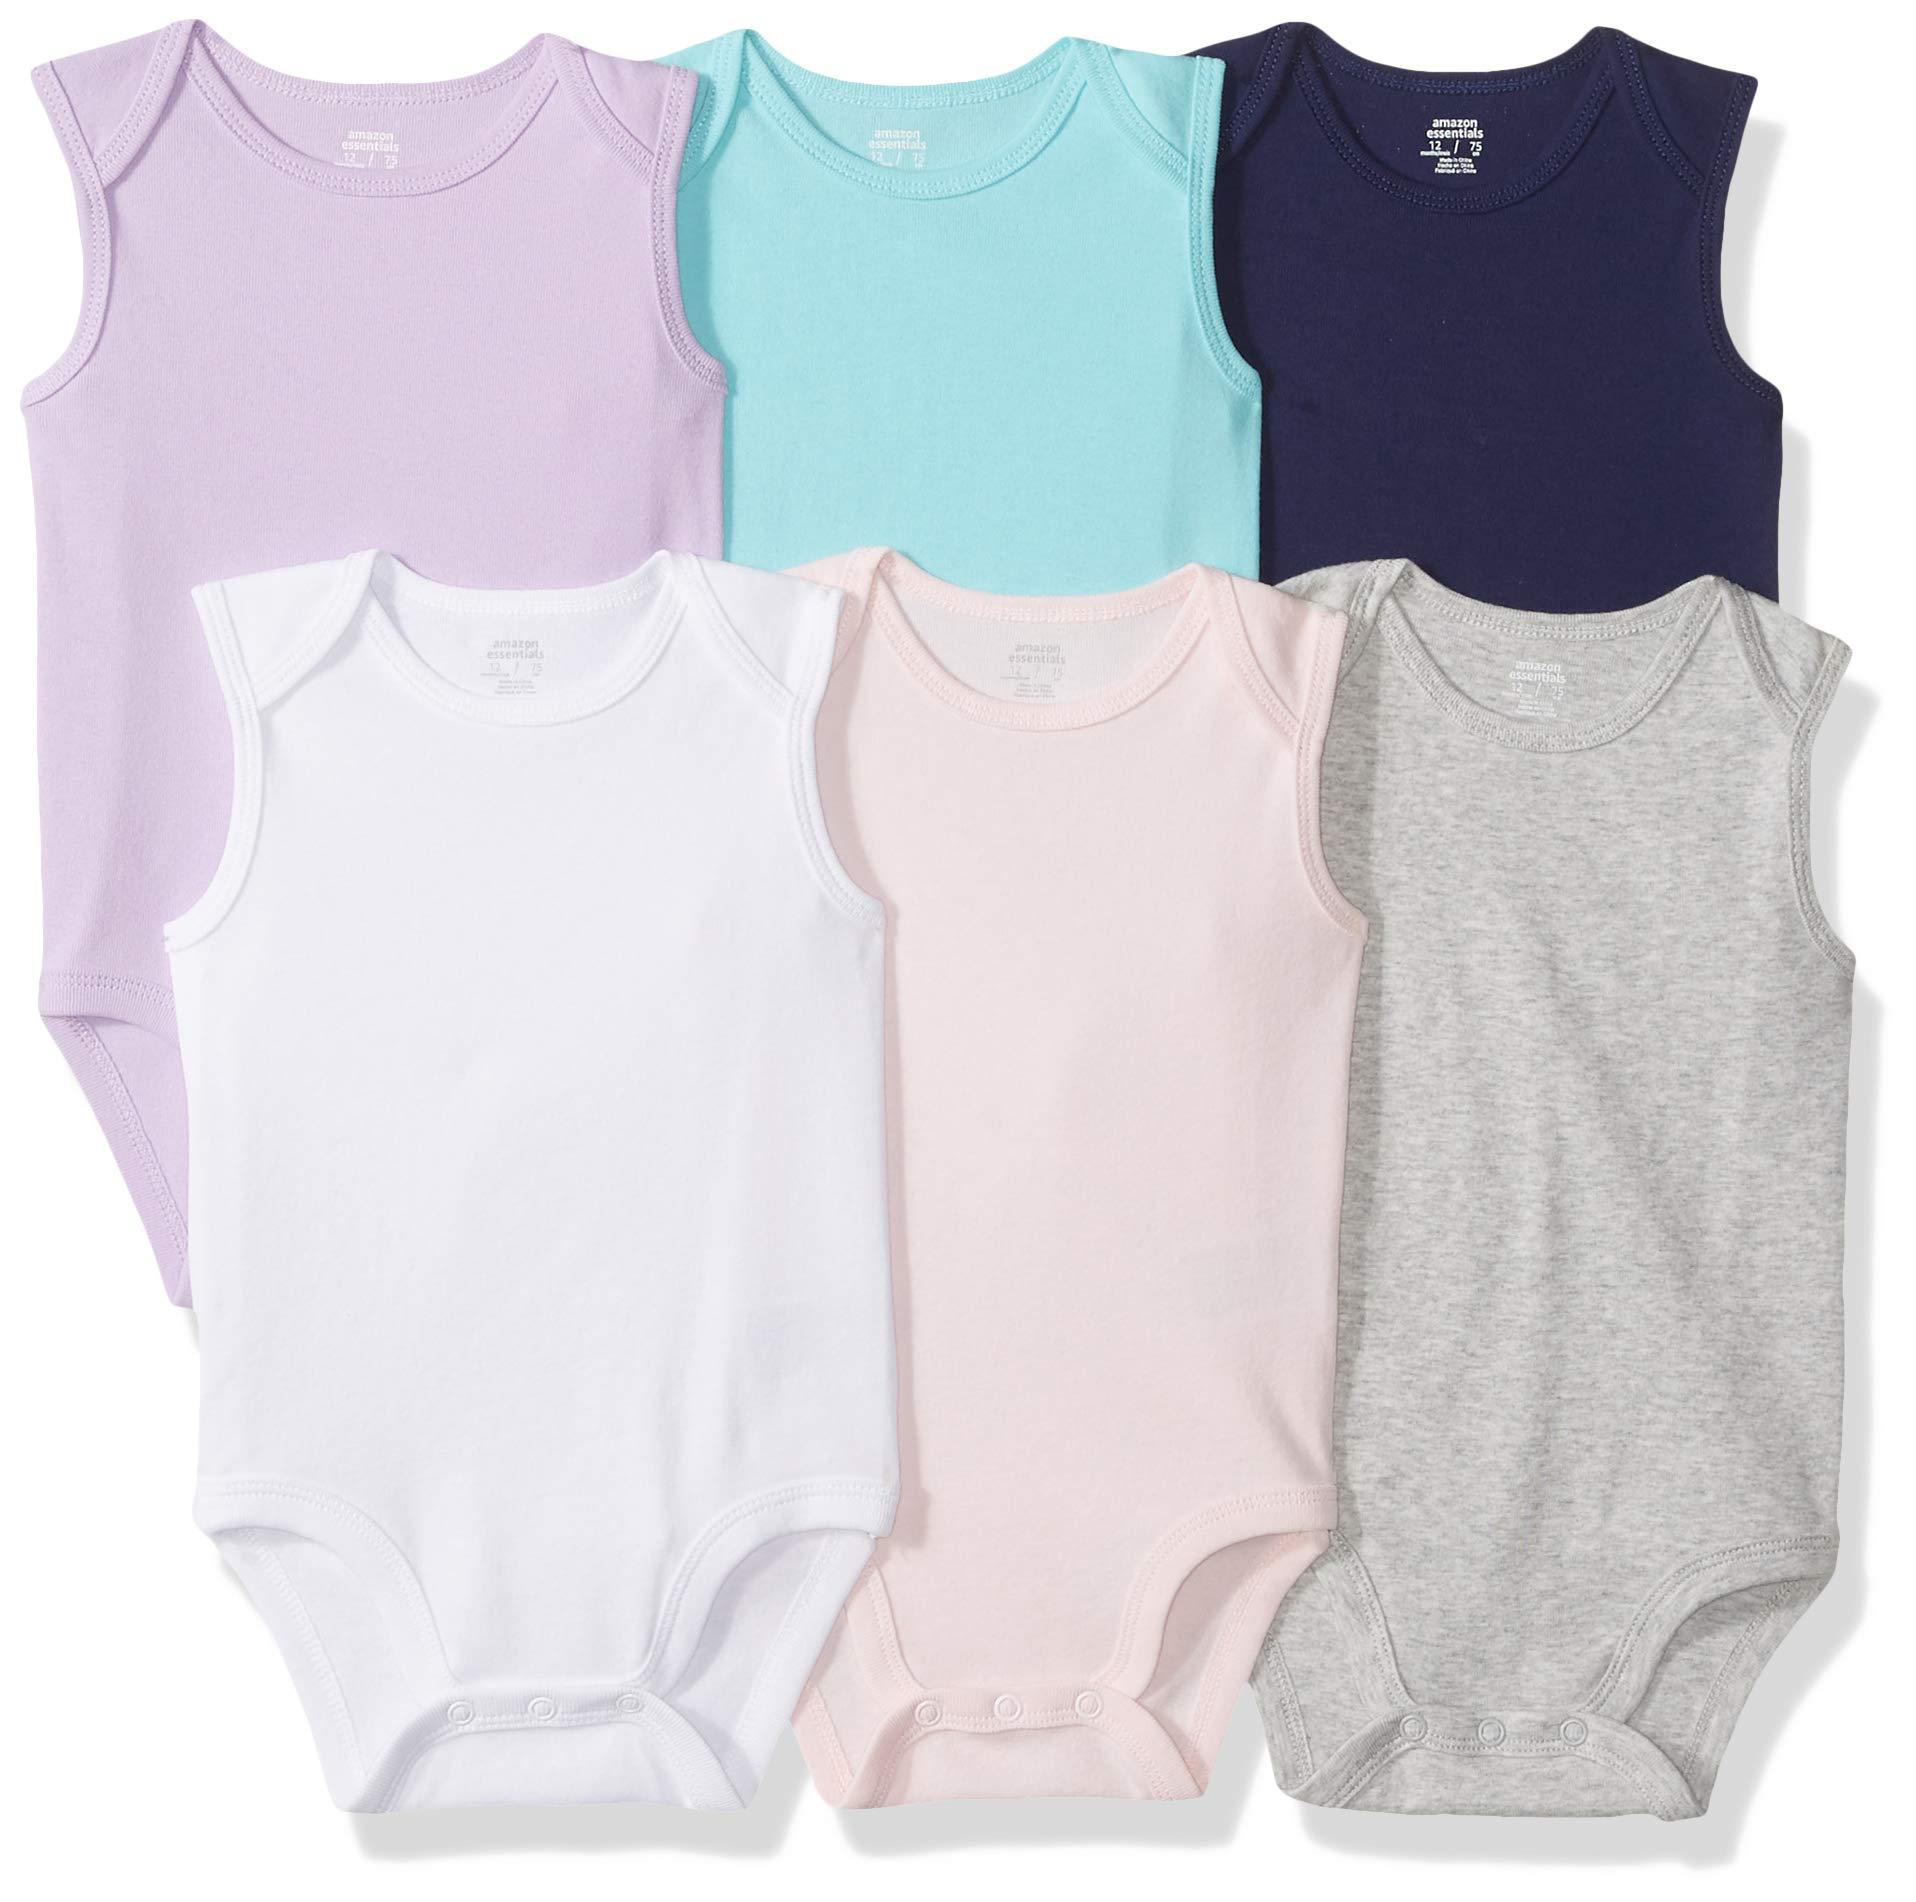 Essentials Baby Girls 6-Pack Sleeveless Bodysuits